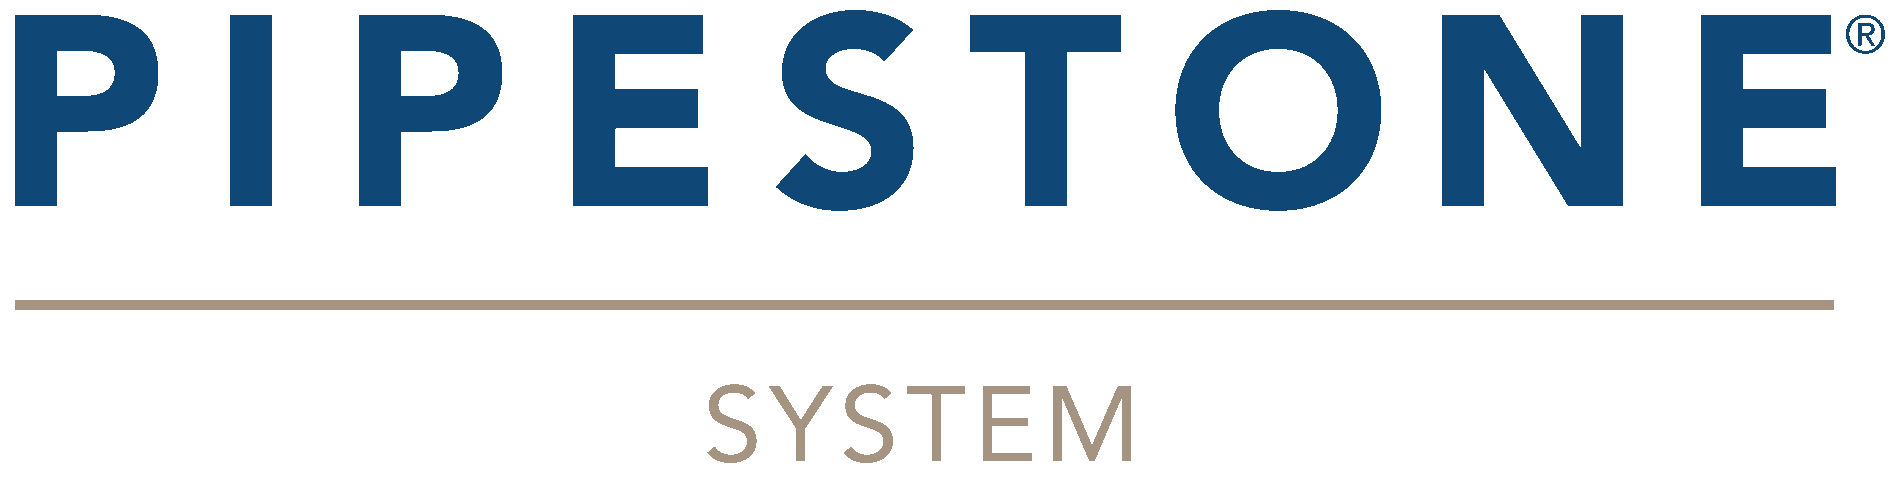 Pipestone System